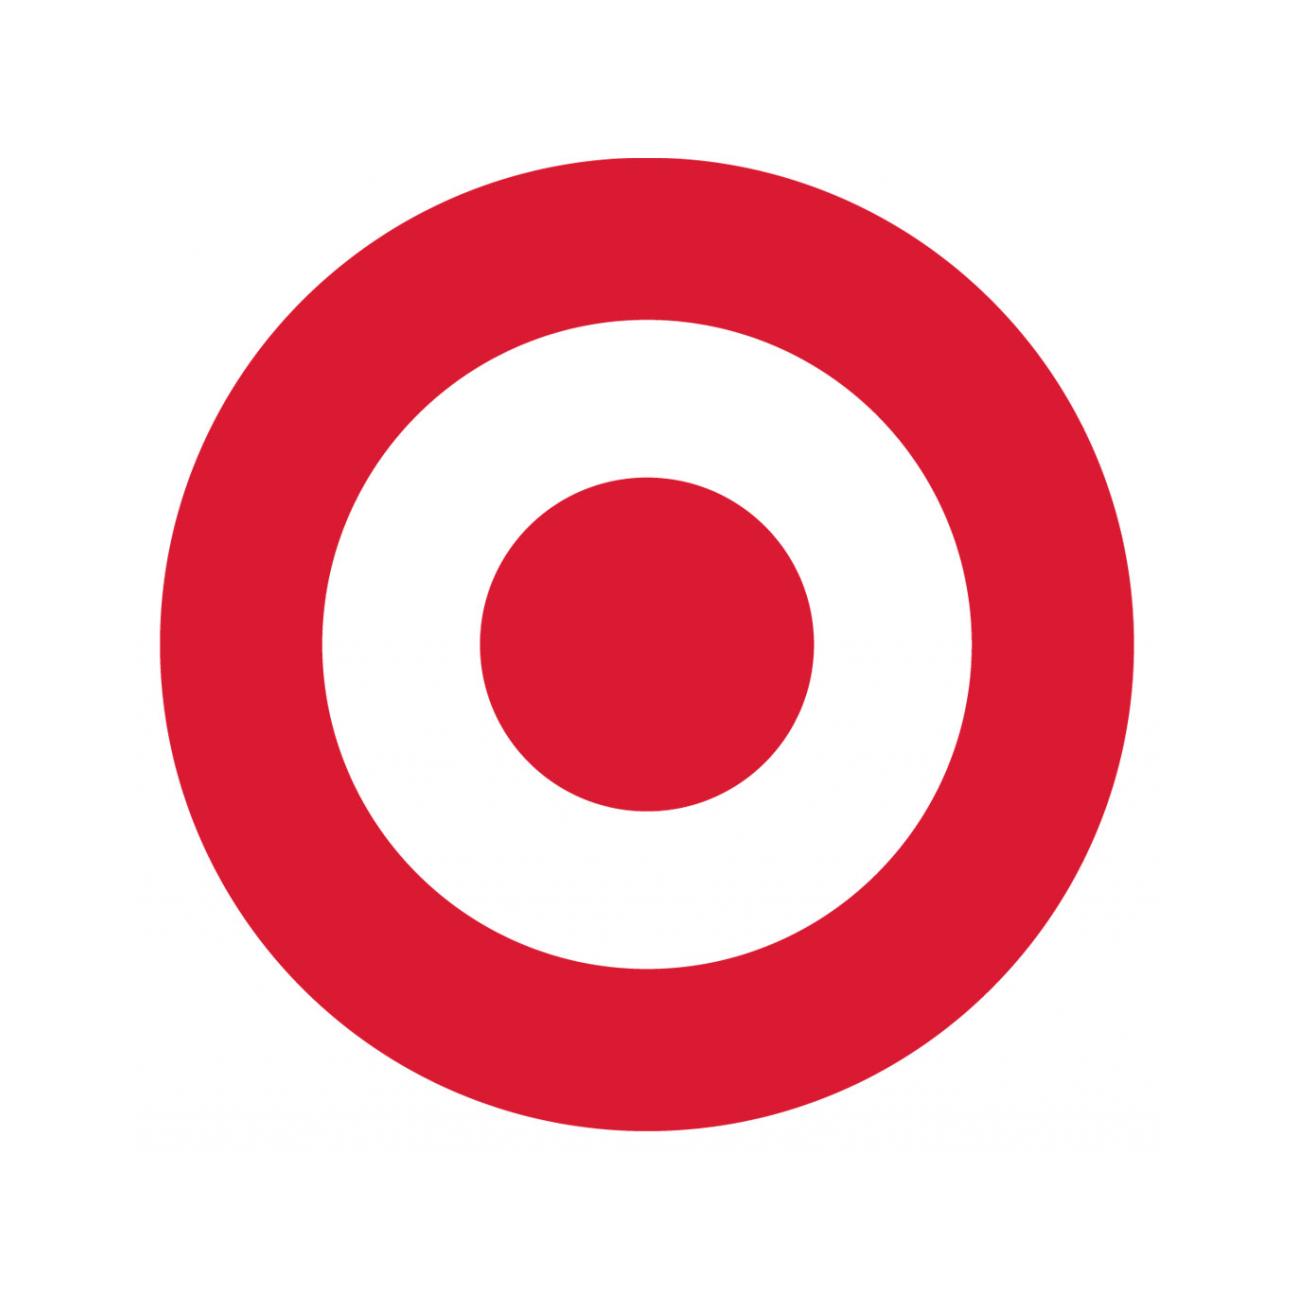 target-logo-clipart-4.png